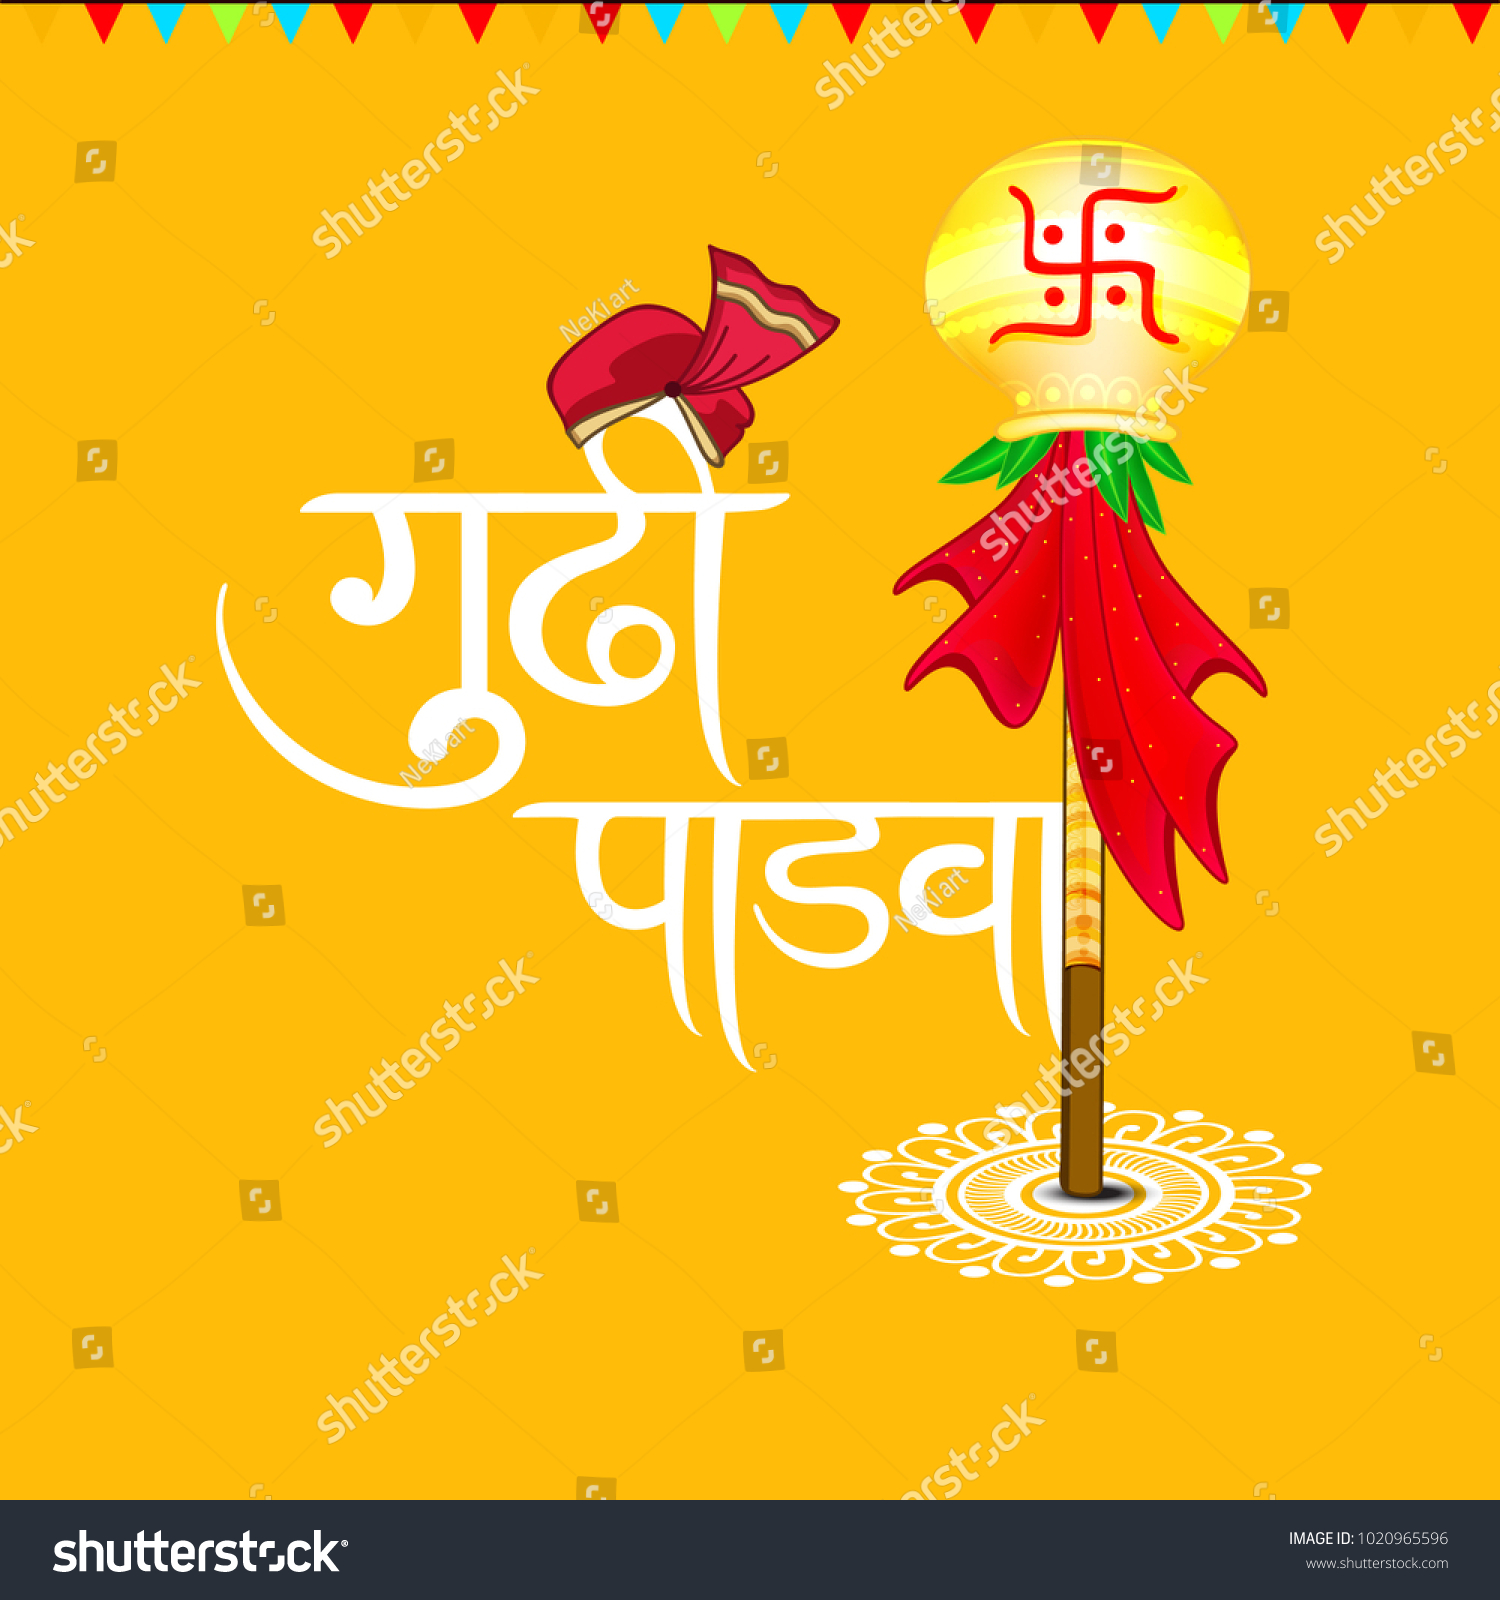 Happy Gudi Padwa Marathi New Year Stock Vector 1020965596 Shutterstock